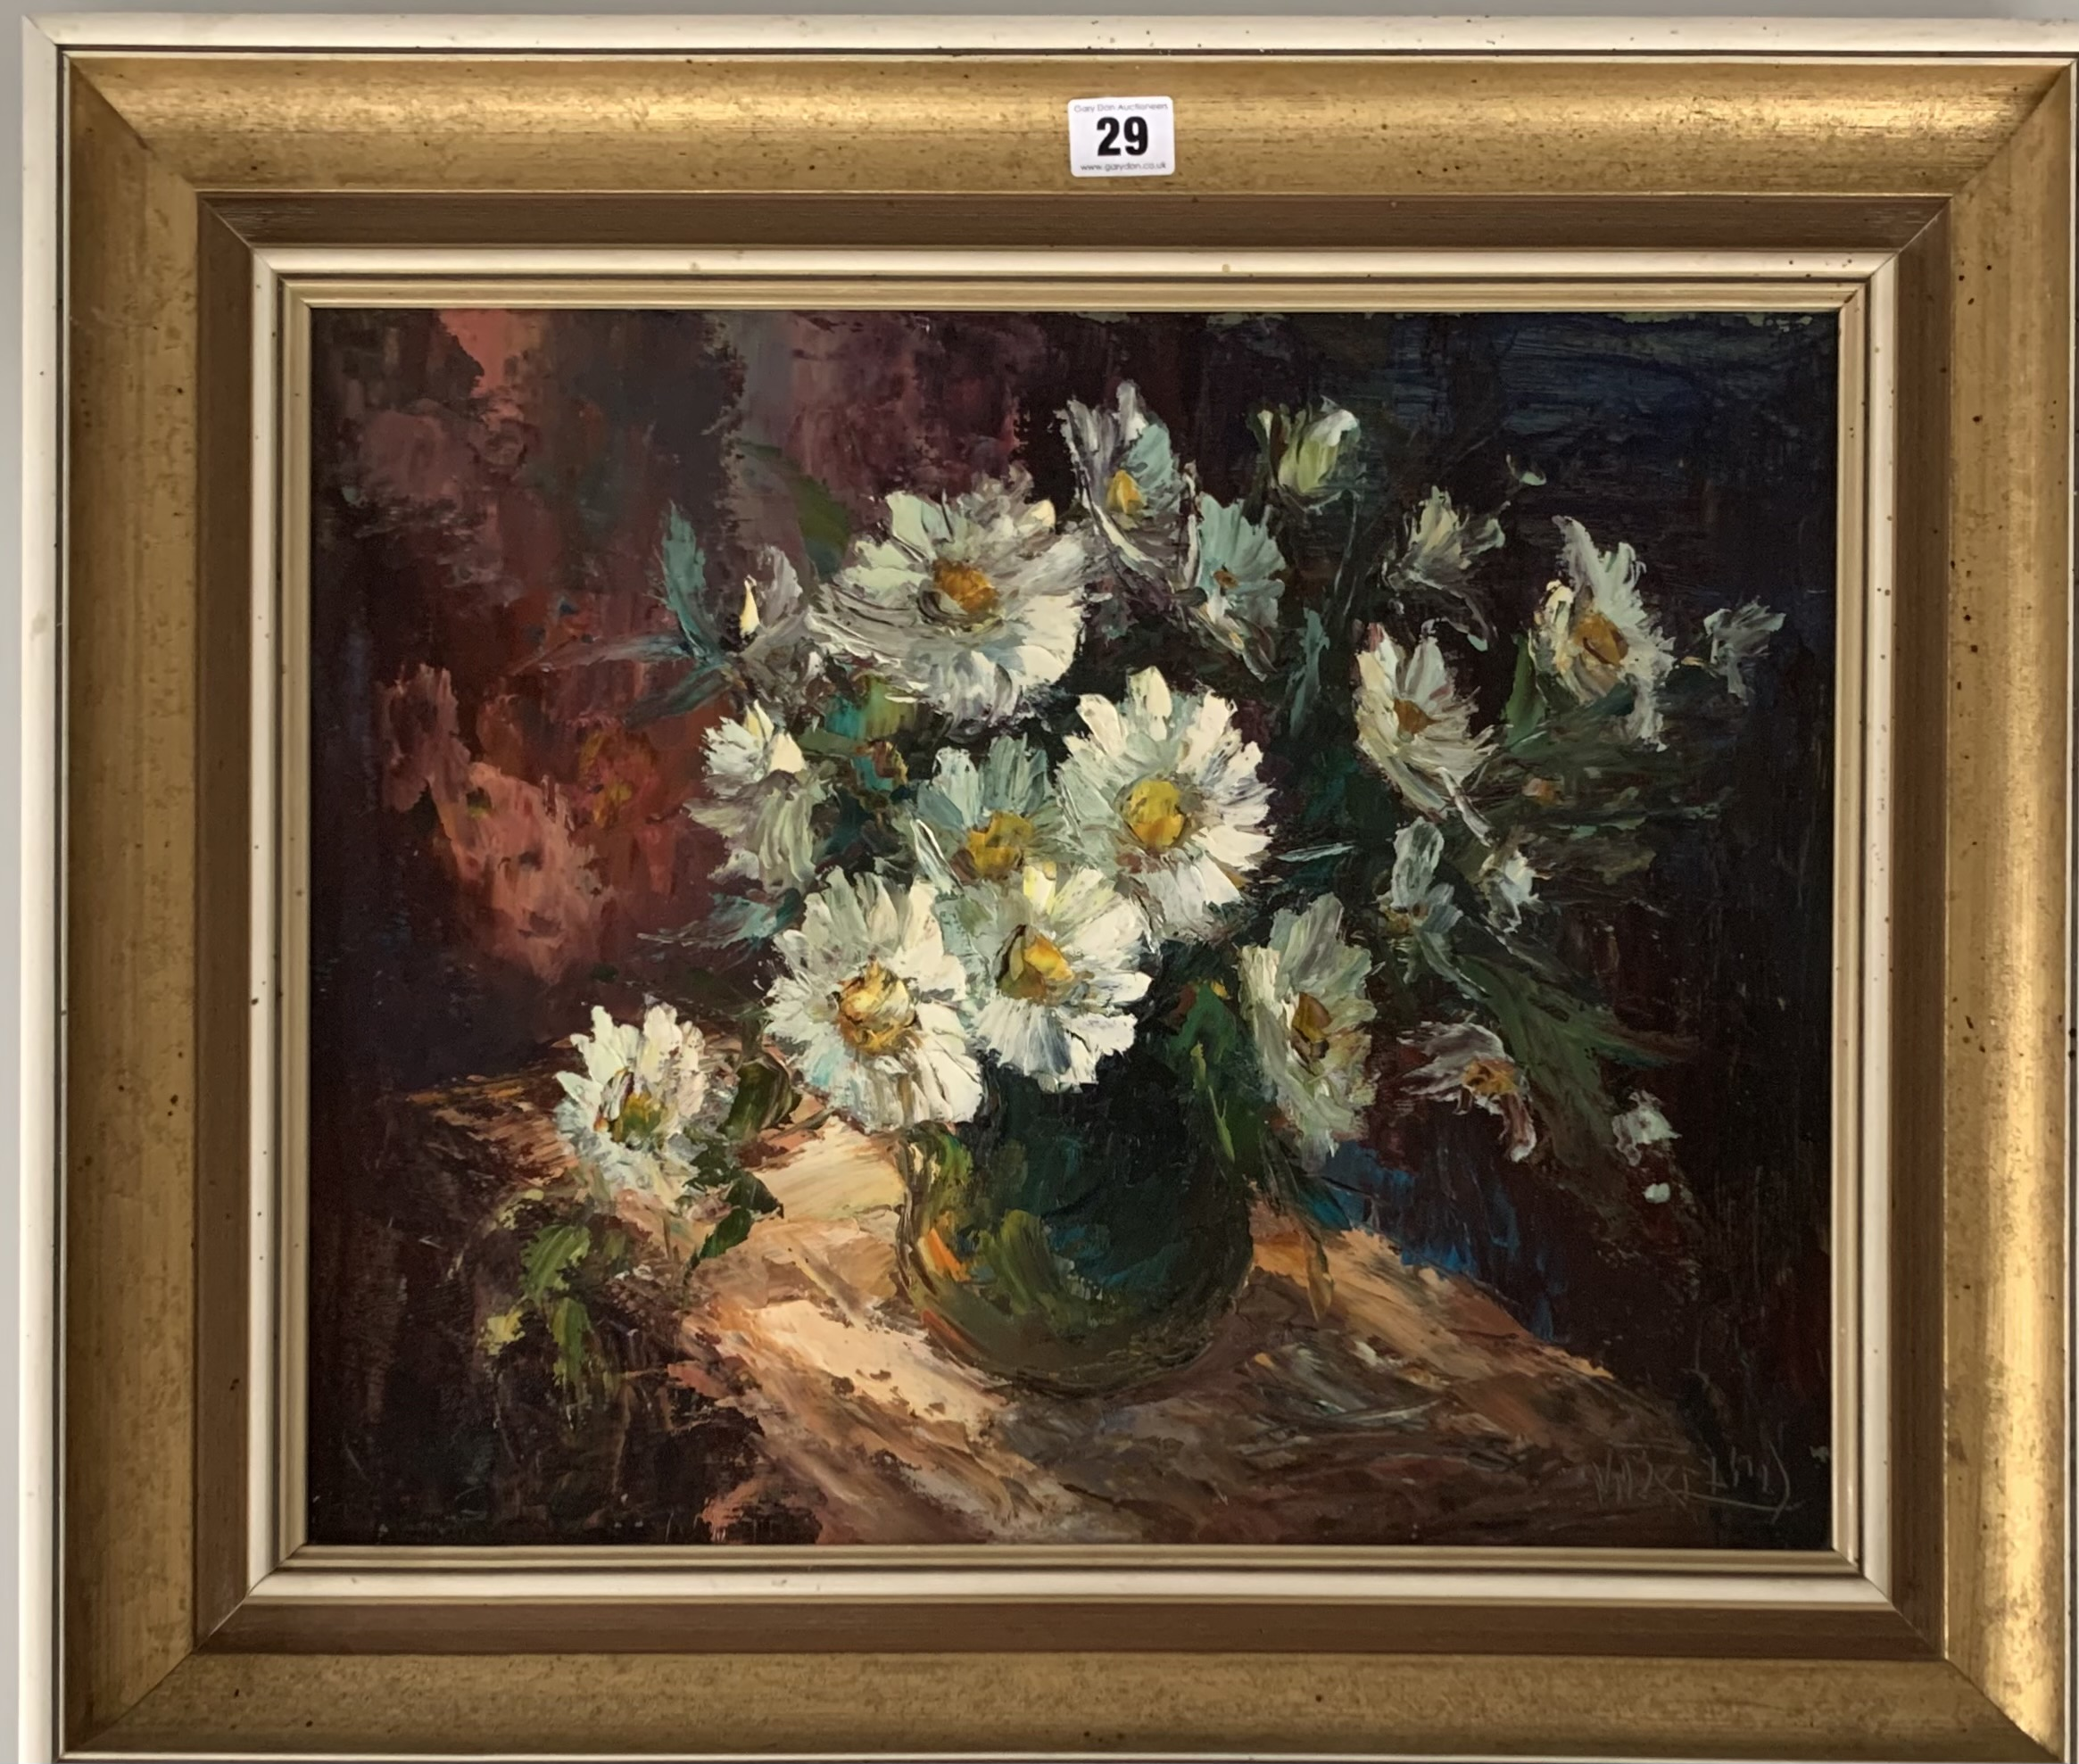 "Oil on board of flowers in vase by V. Berzins. Image 18"" x 15"", frame 24"" x 20.5"""